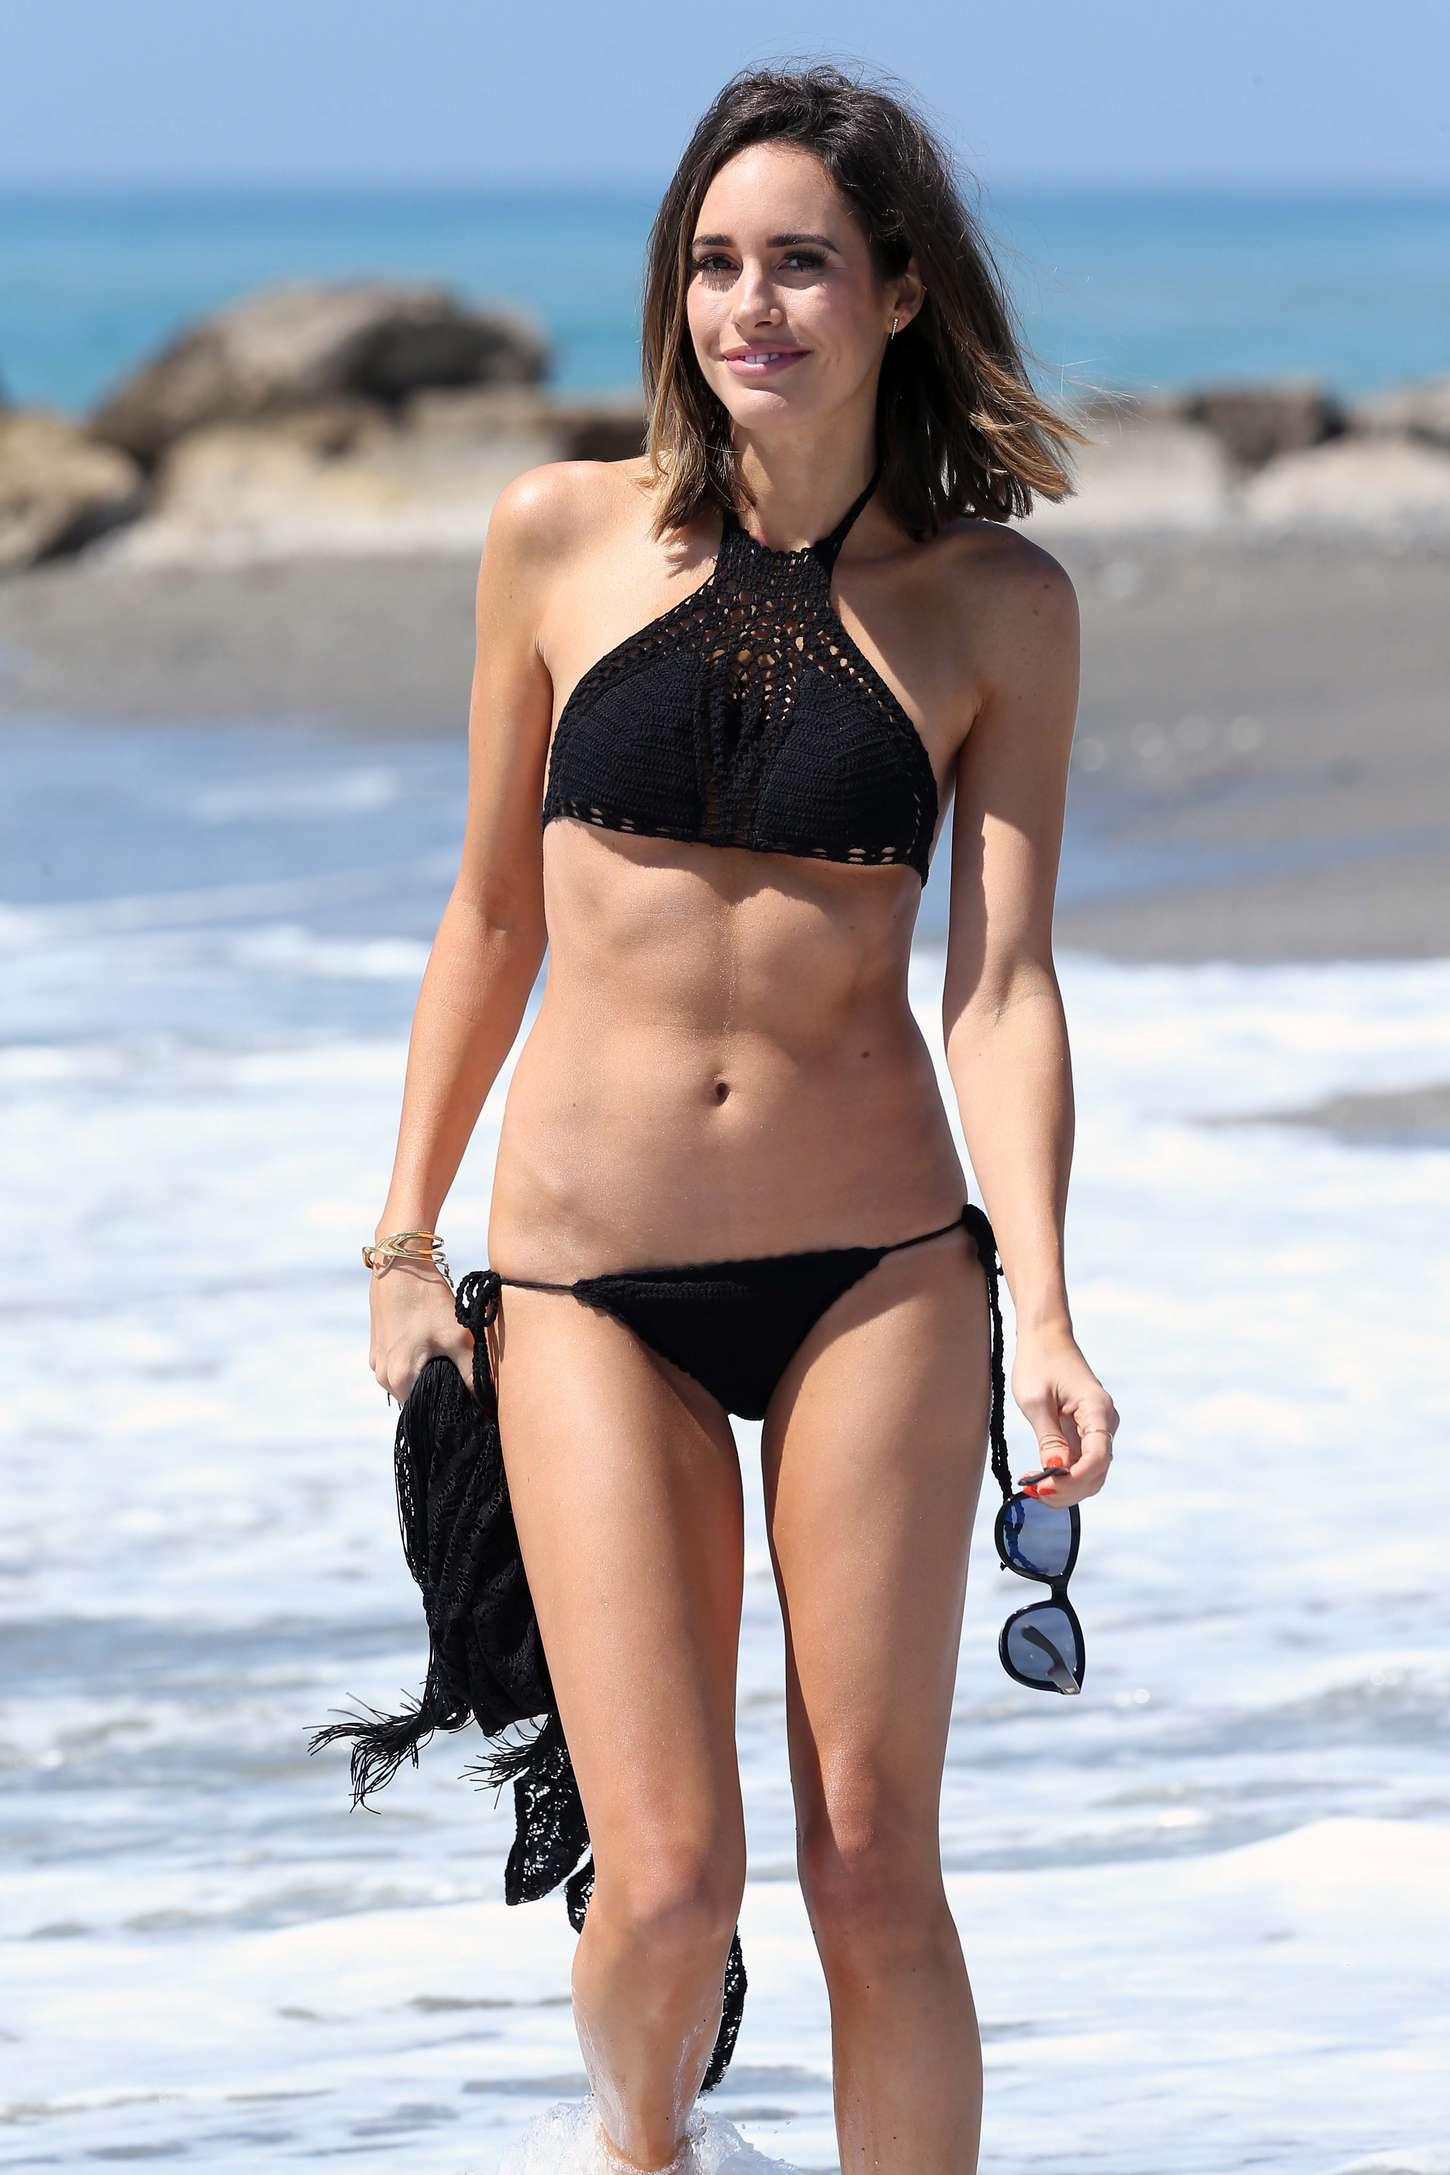 Louise Roe 2015 : Louise Roe in Black Bikini -45